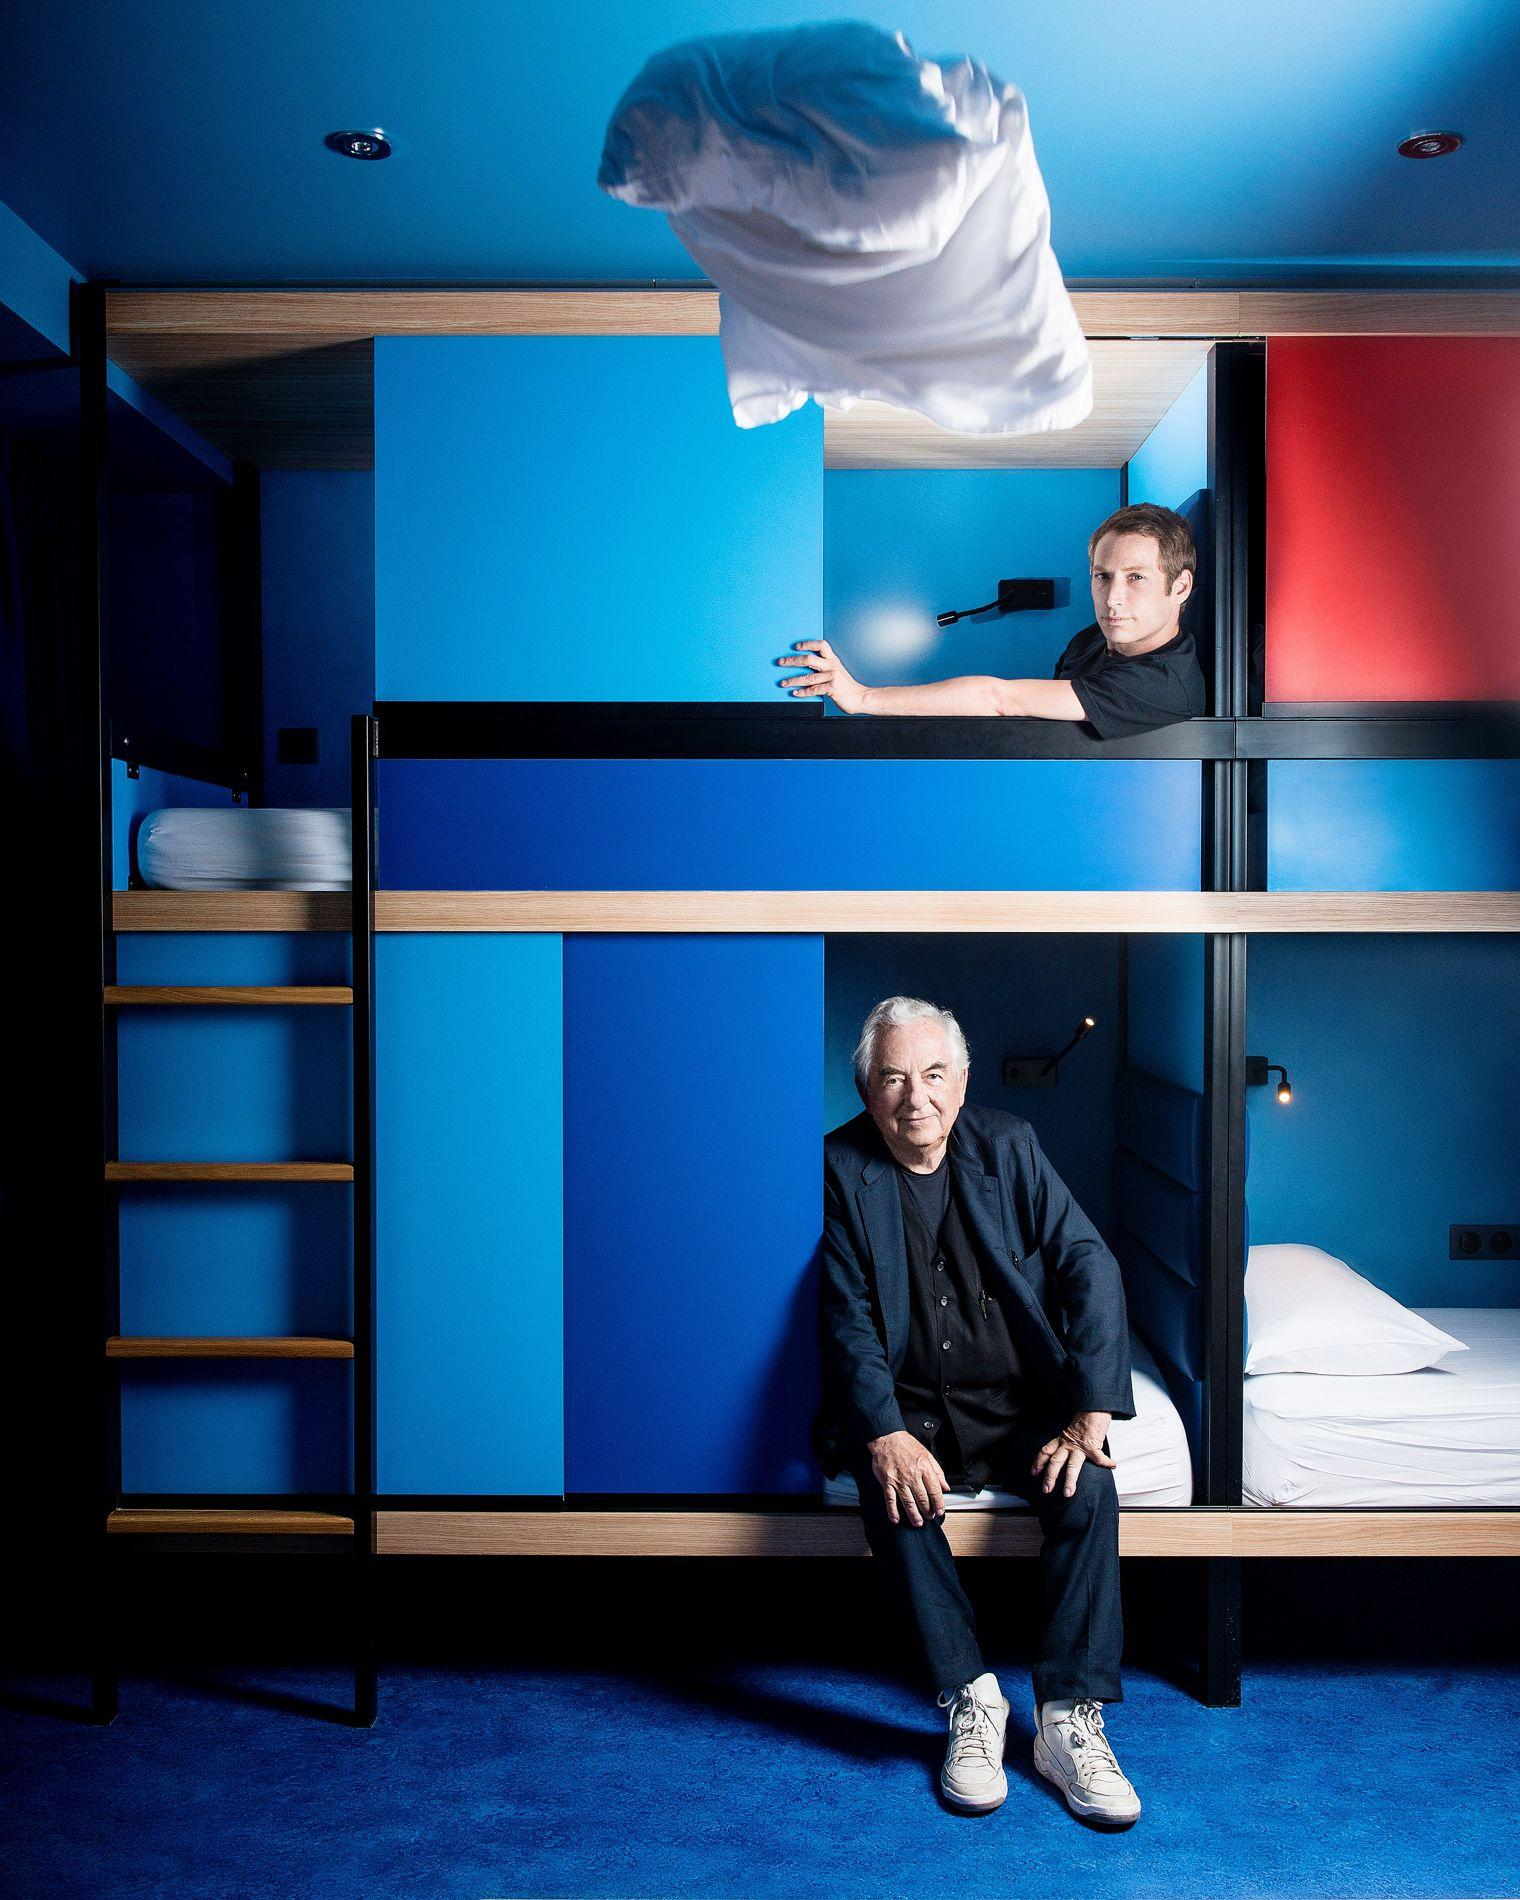 Yooma paris la nouvelle auberge du futur imagin e par for Design hotel daniel campanella